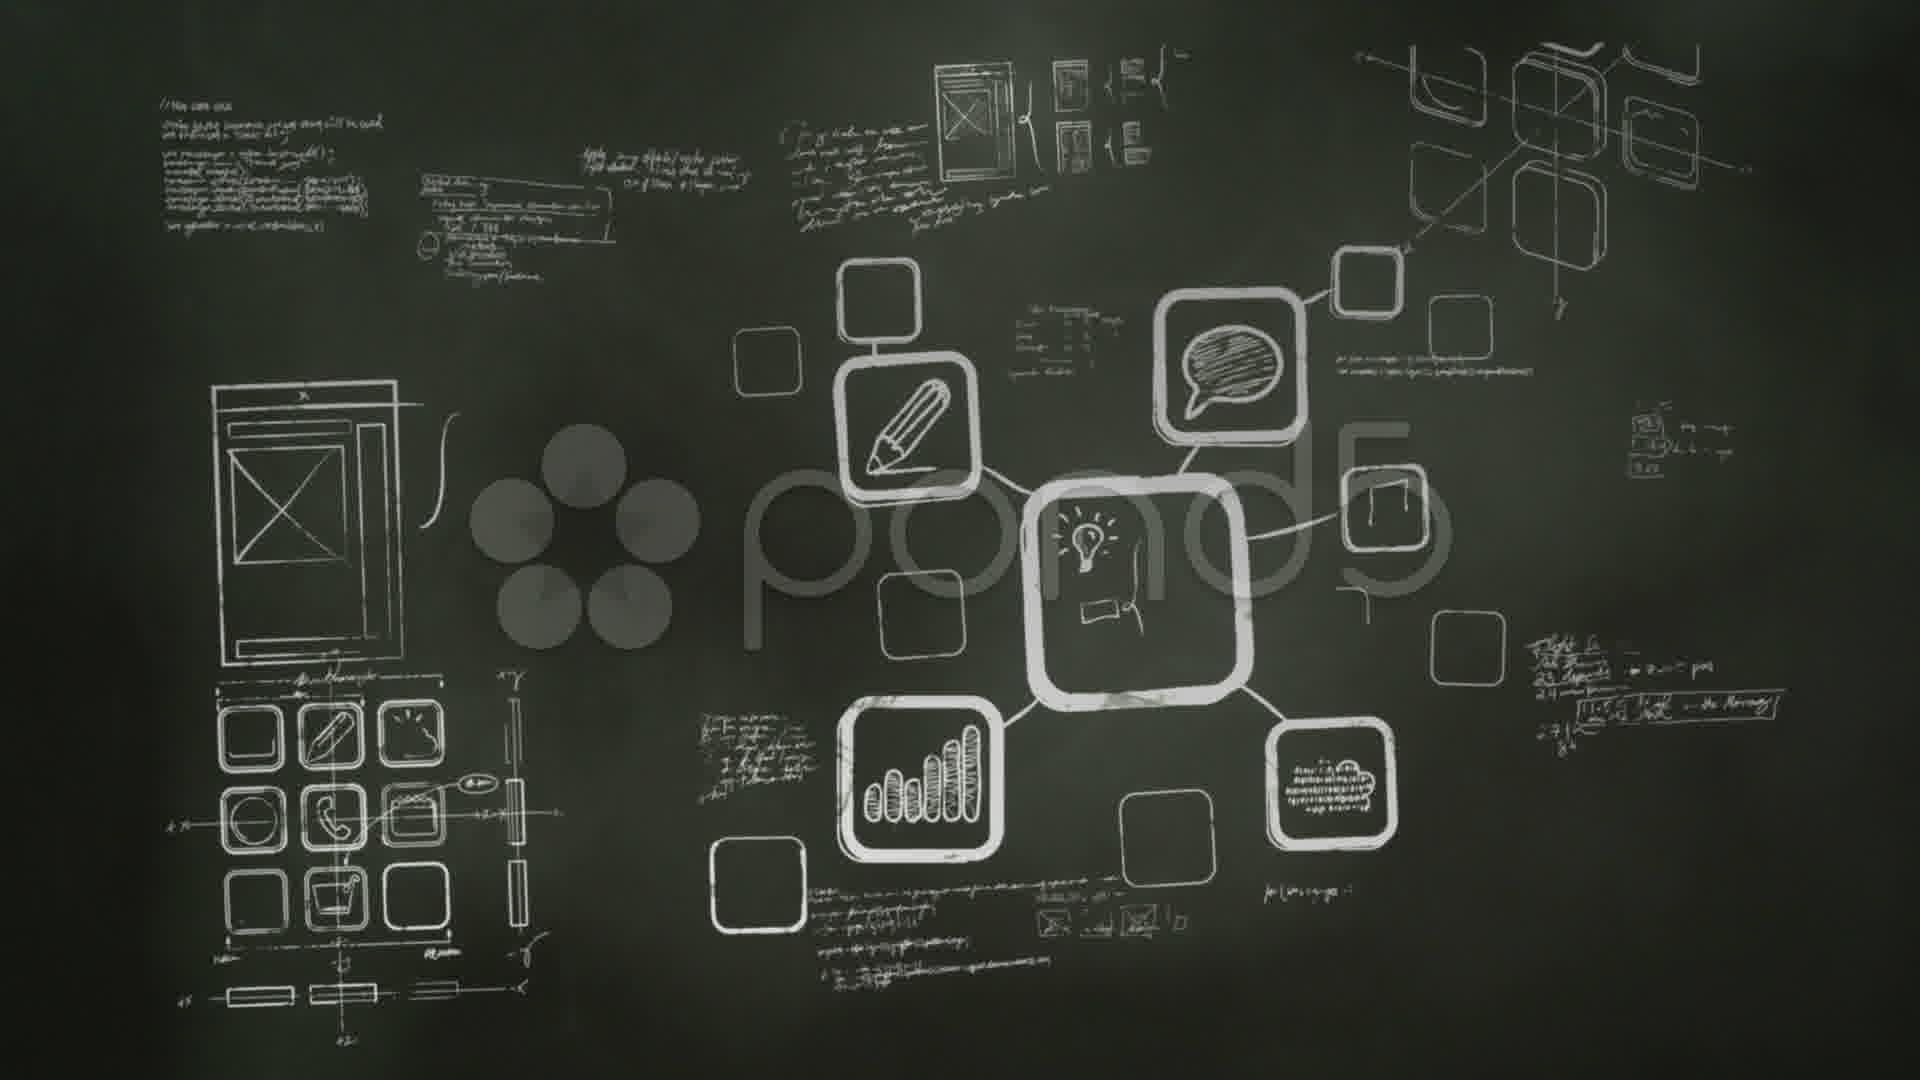 developer wallpaper hd 71 images